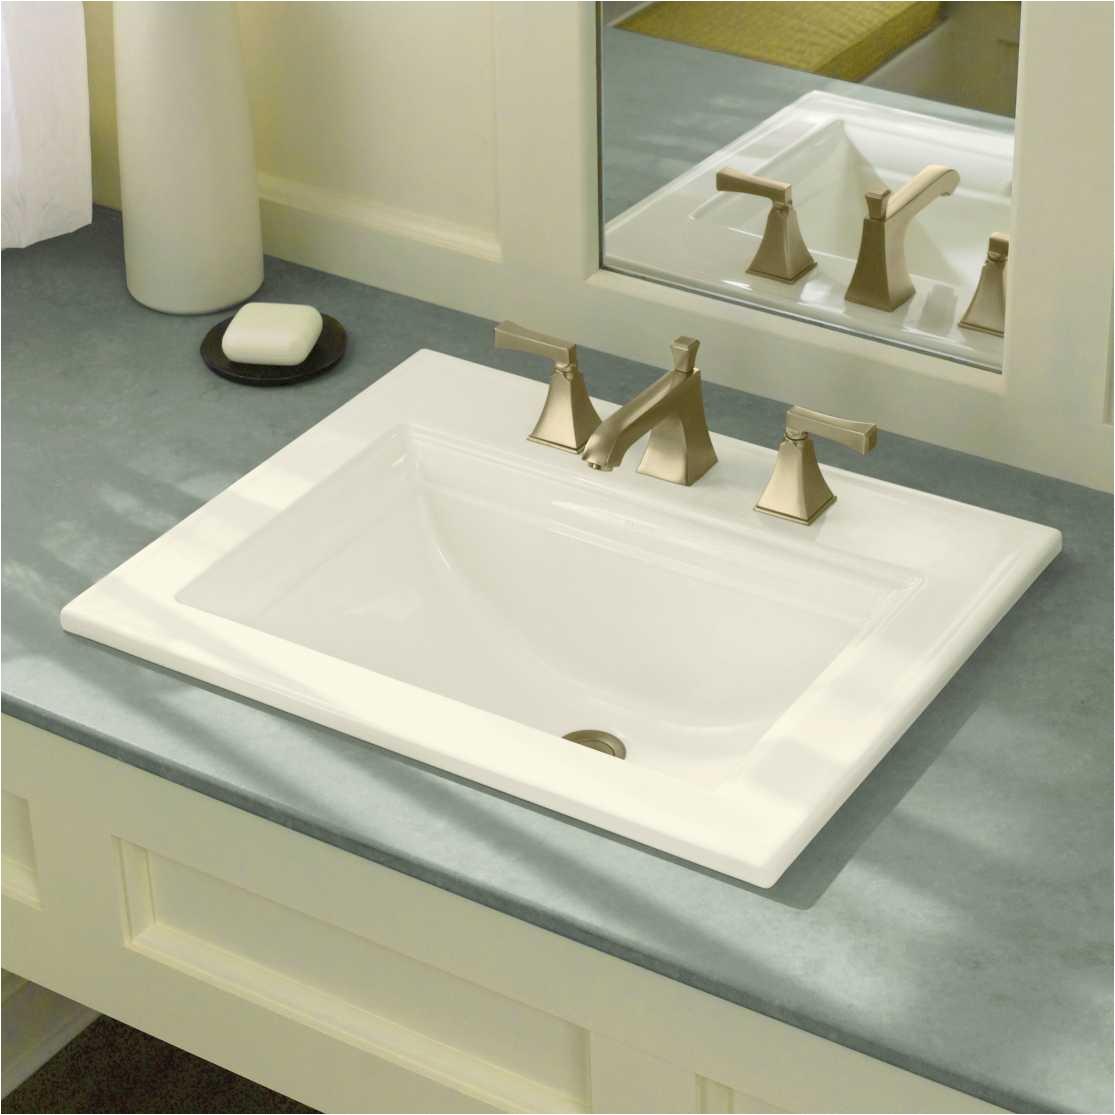 Handicap Accessible Bathtub Luxury Walk In Bathtub Beautiful Walk In Bathtub Lowes toilets Lowes